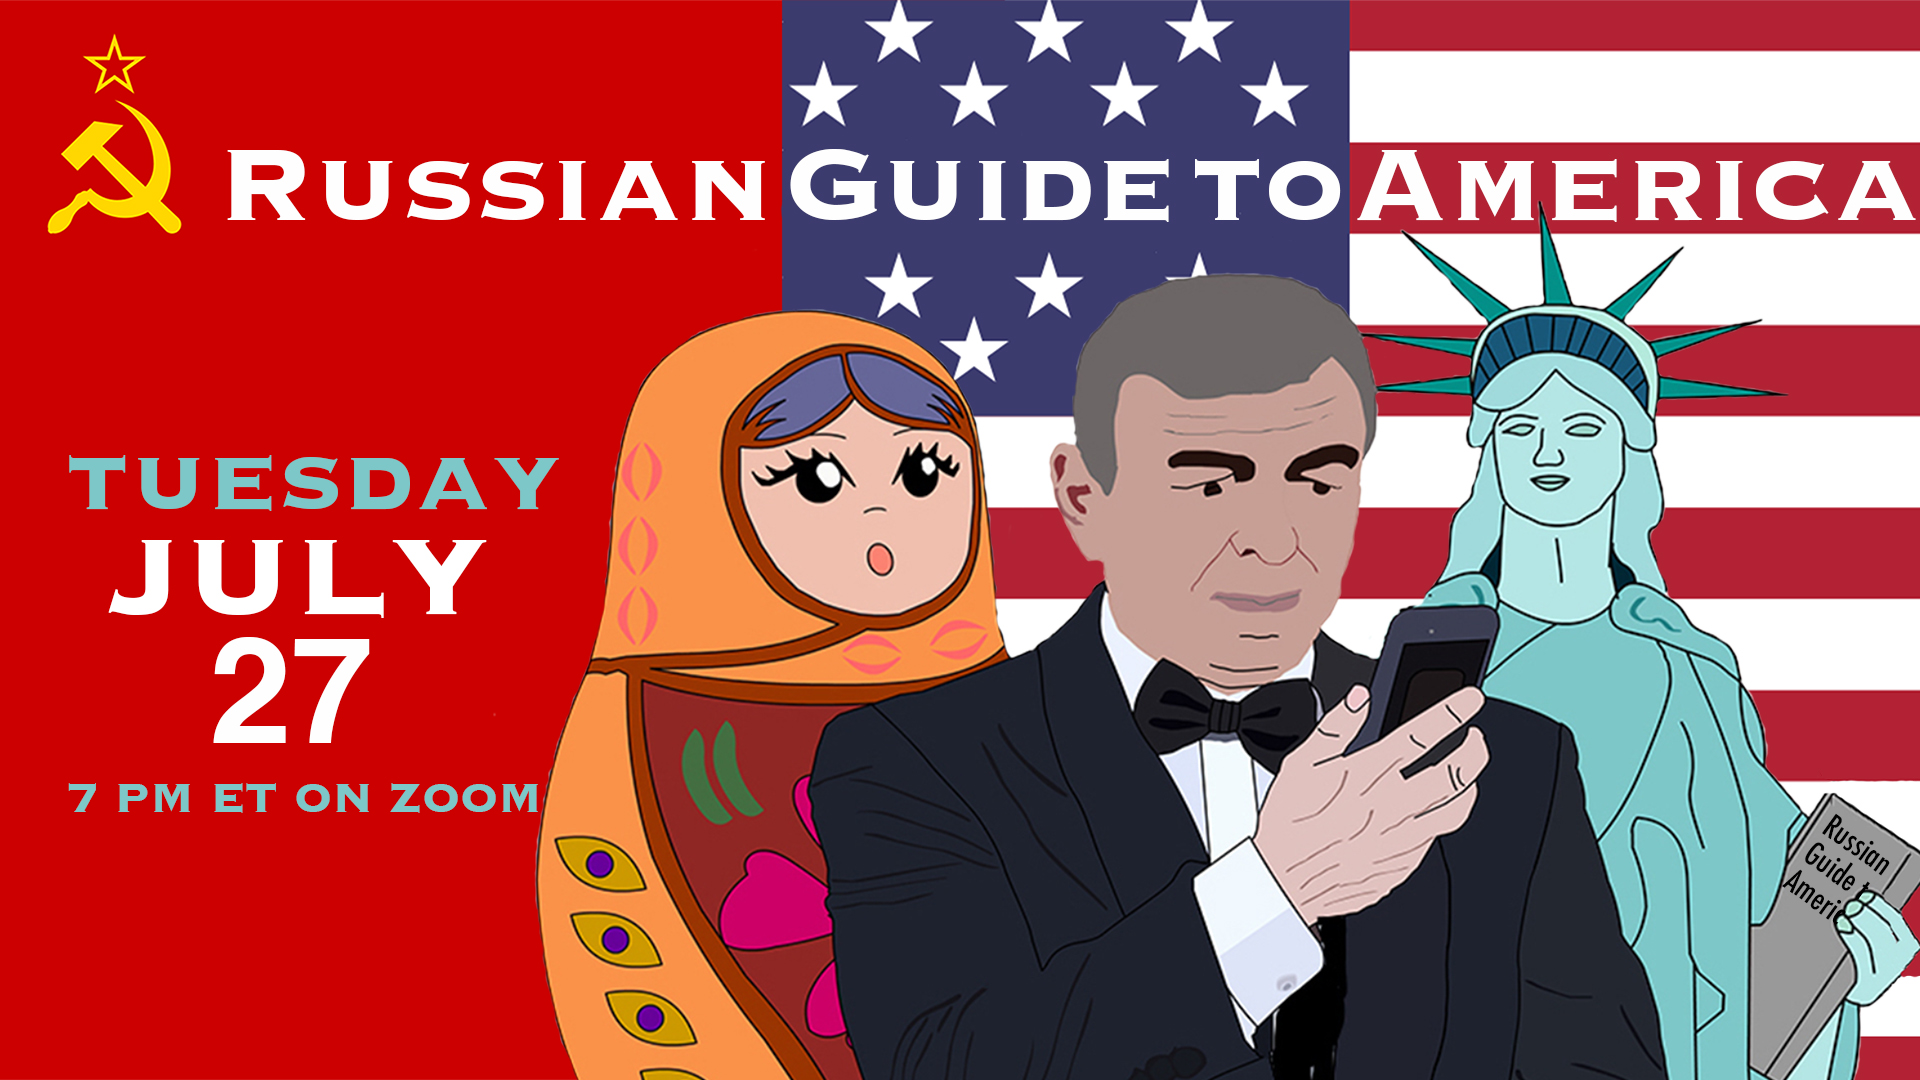 Russian Gide to America 20210727